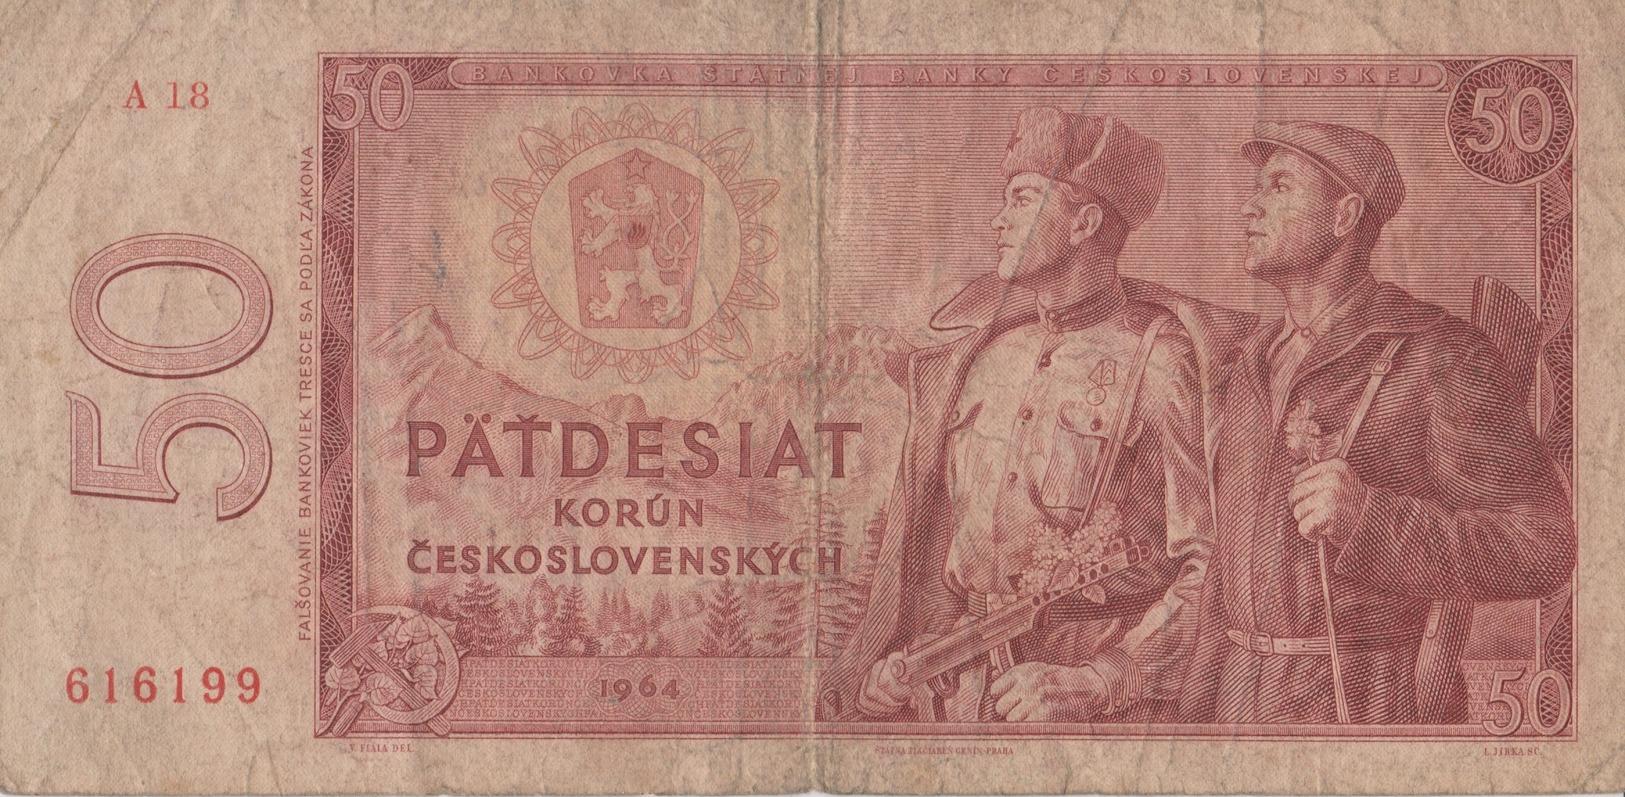 Tchécoslovaquie / 50 Korun / 1964 / P-90(b) / VF - Cecoslovacchia